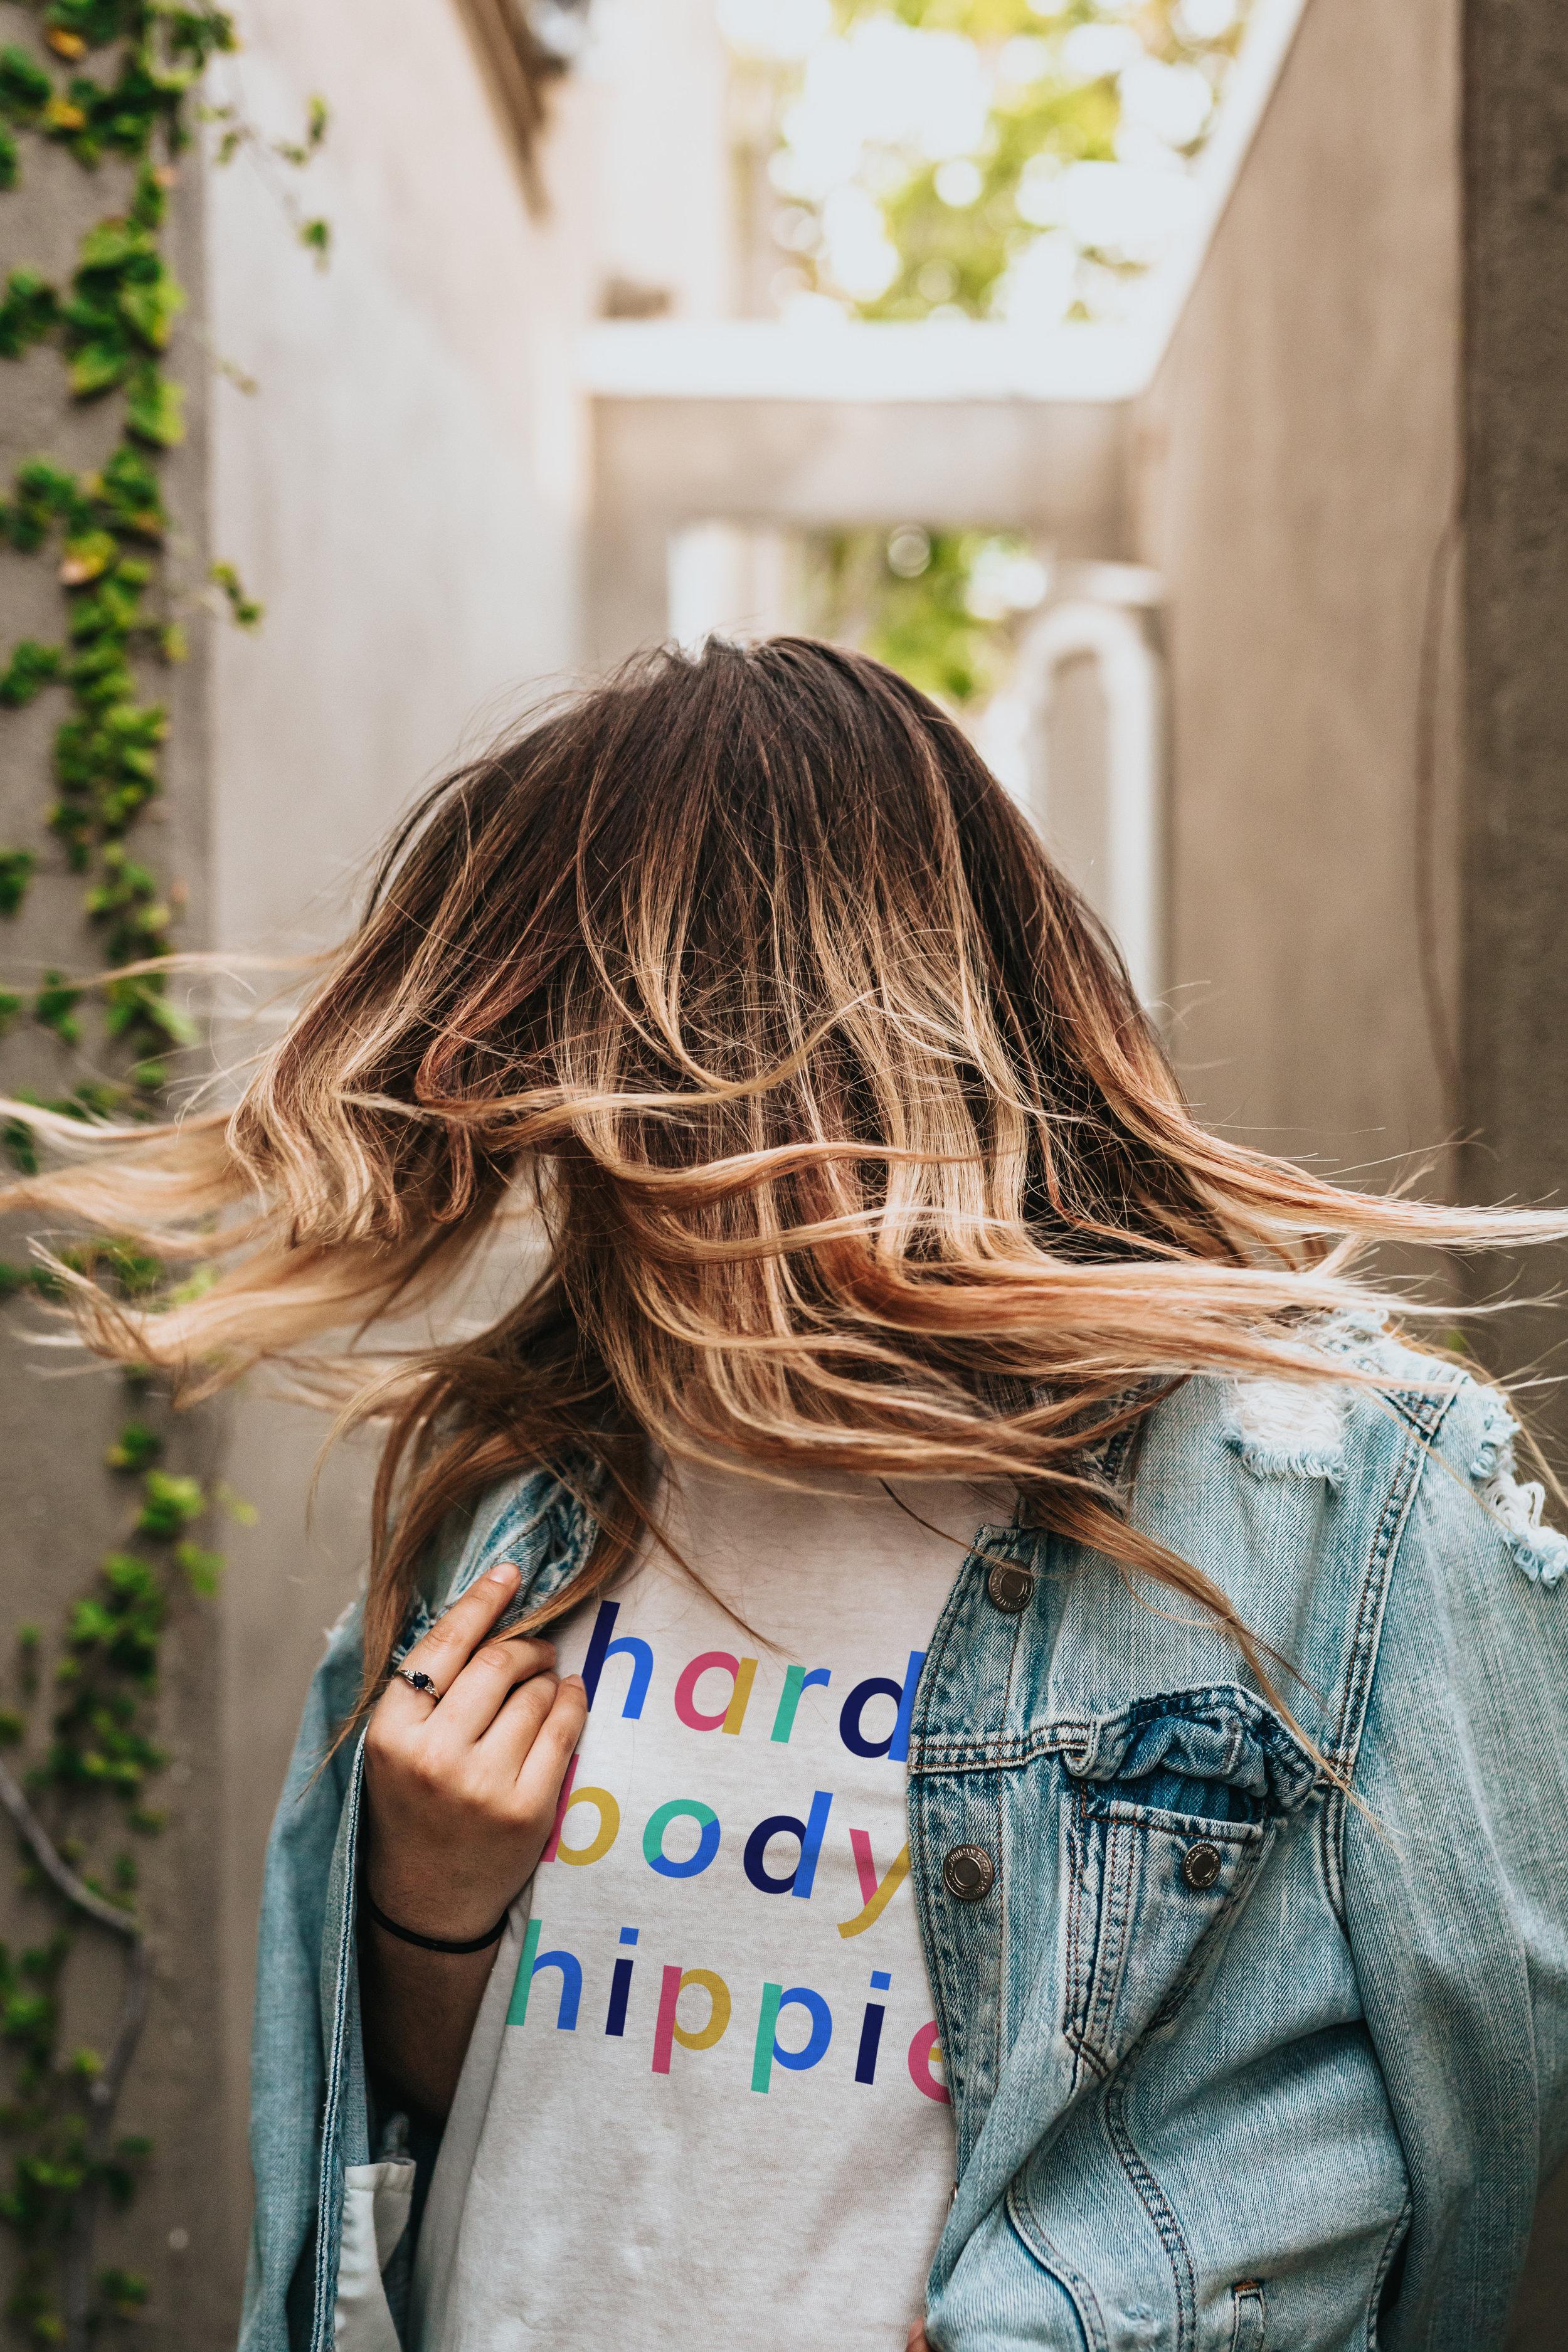 Hardbody Hippie Graphic T-Shirt Womens Leisure Apparel High-Quality and Soft